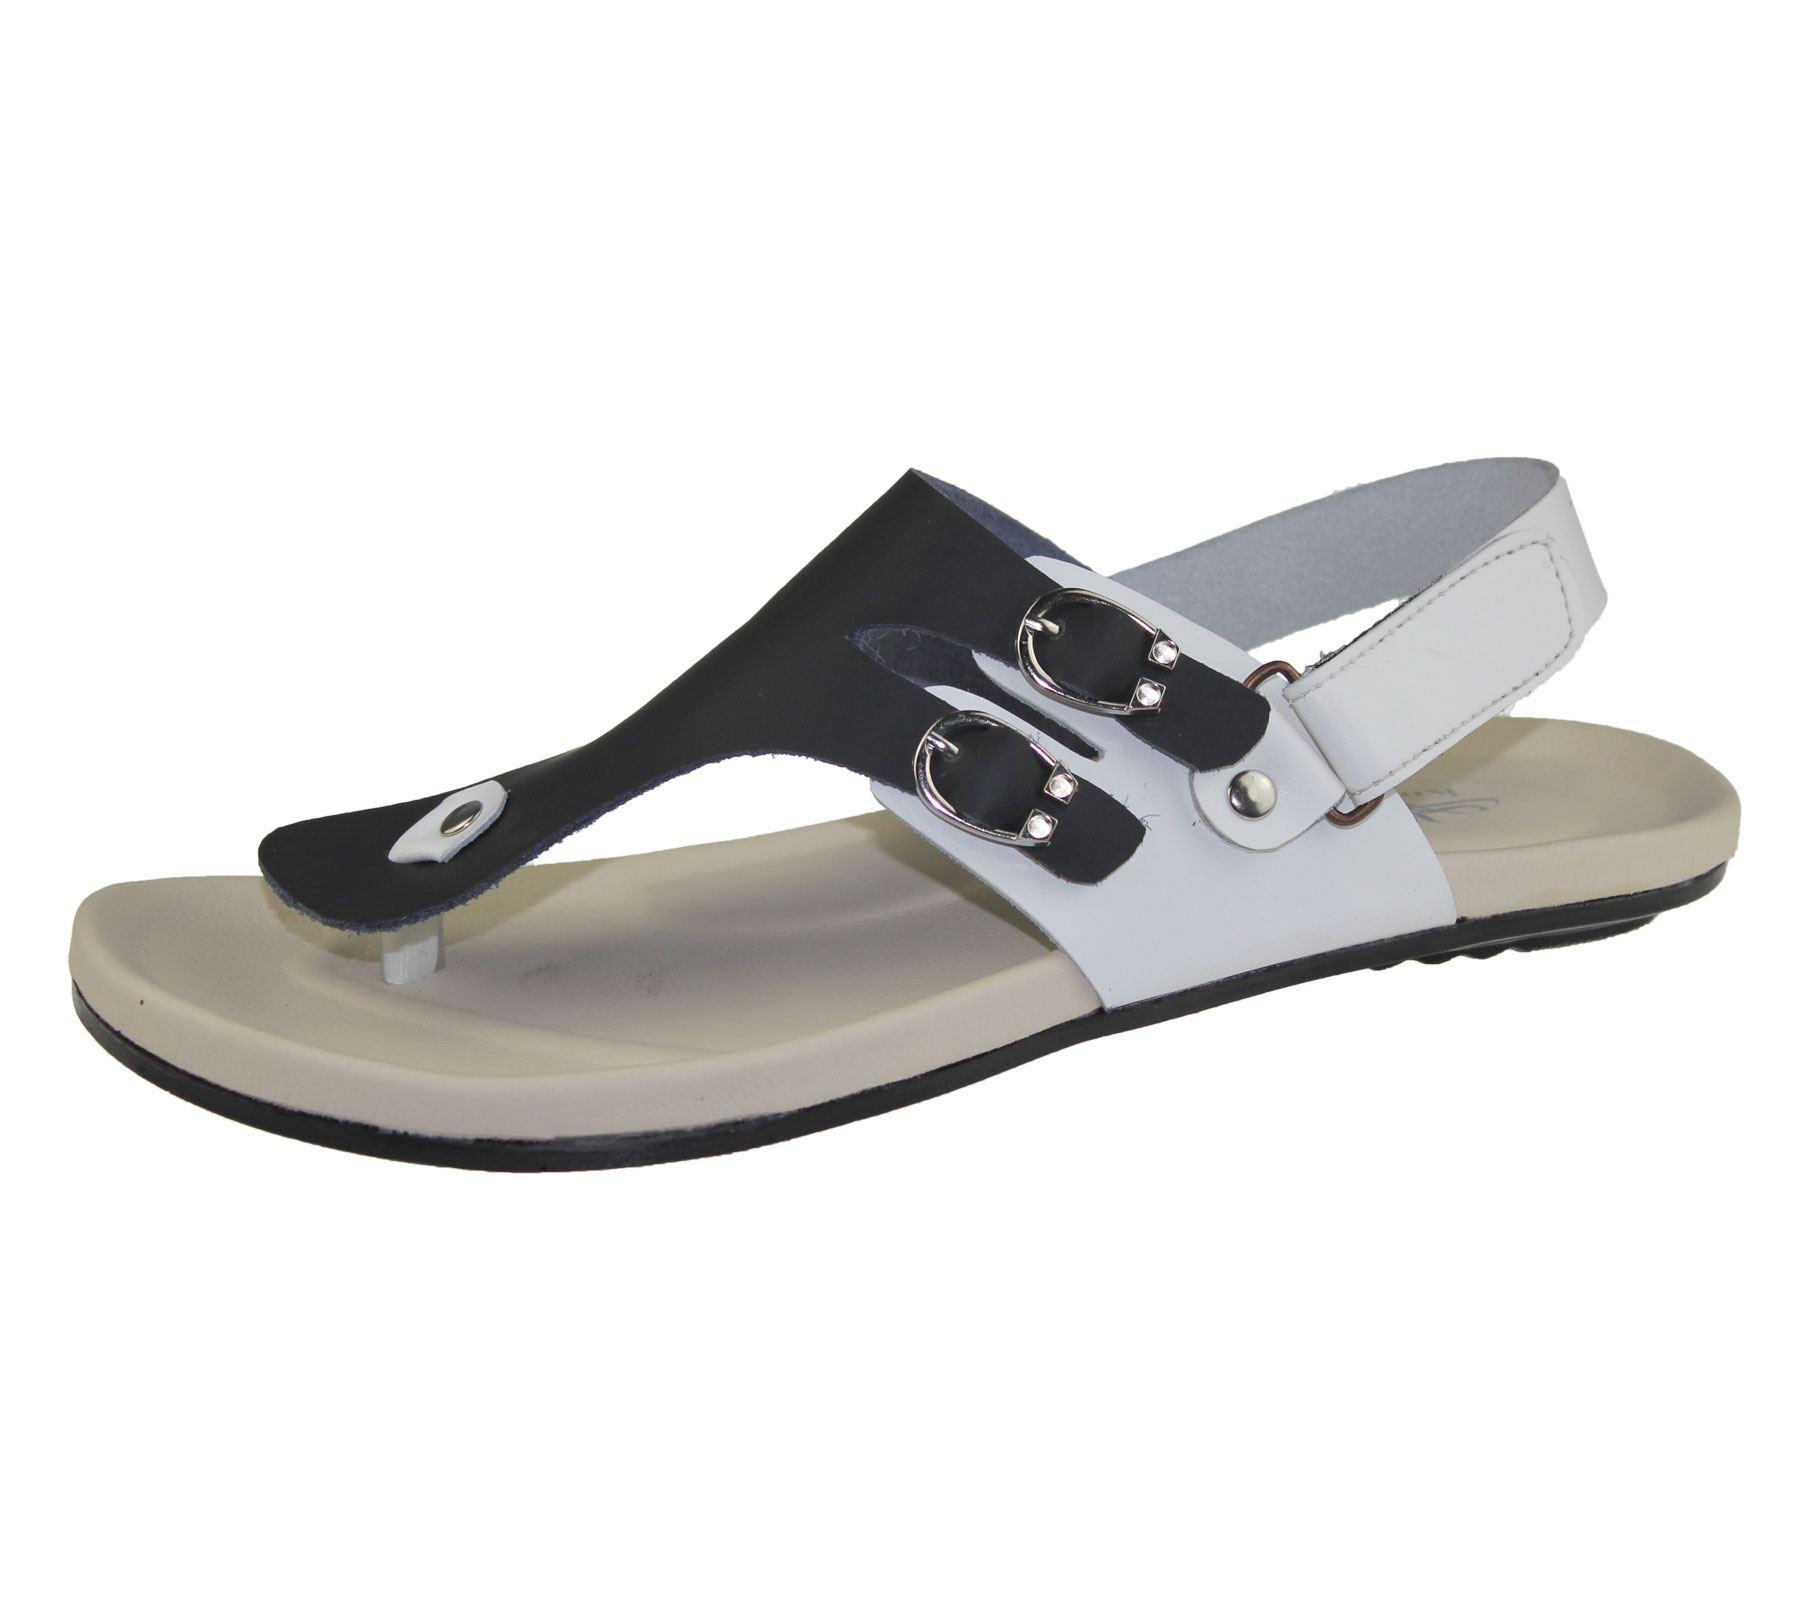 9ed64eab77583 Mens Sandals Casual Beach Fashion Boys Walking Slipper Flip Flop Size